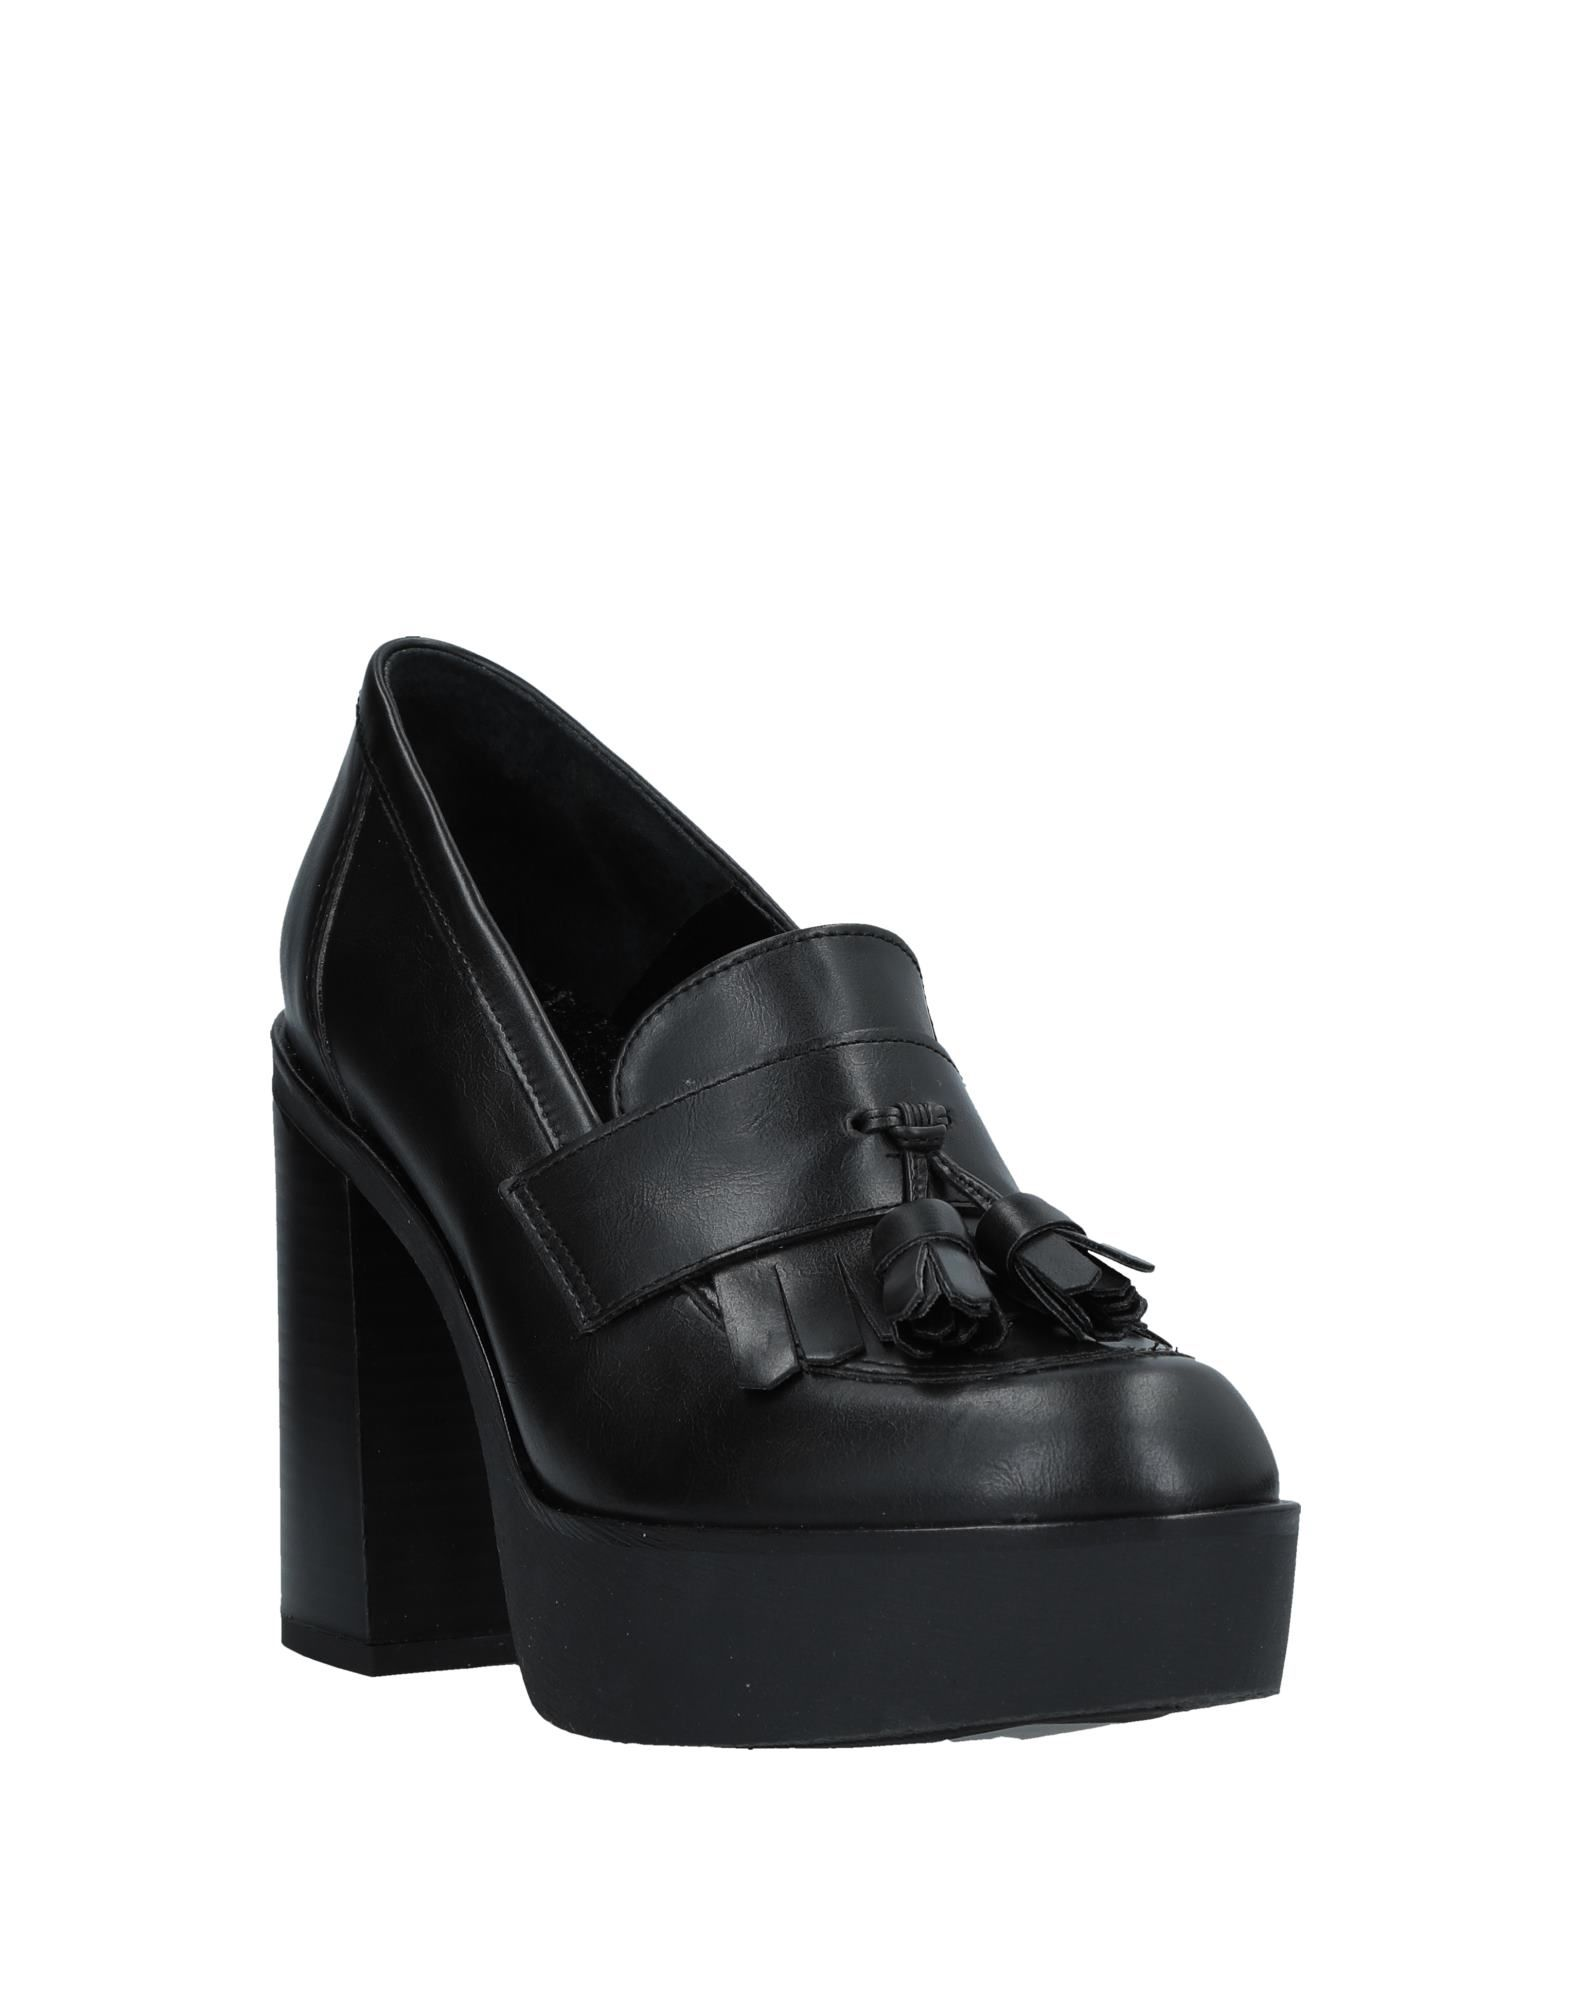 Stilvolle billige Schuhe Chocolà Mokassins 11529915JQ Damen  11529915JQ Mokassins a0c2a0